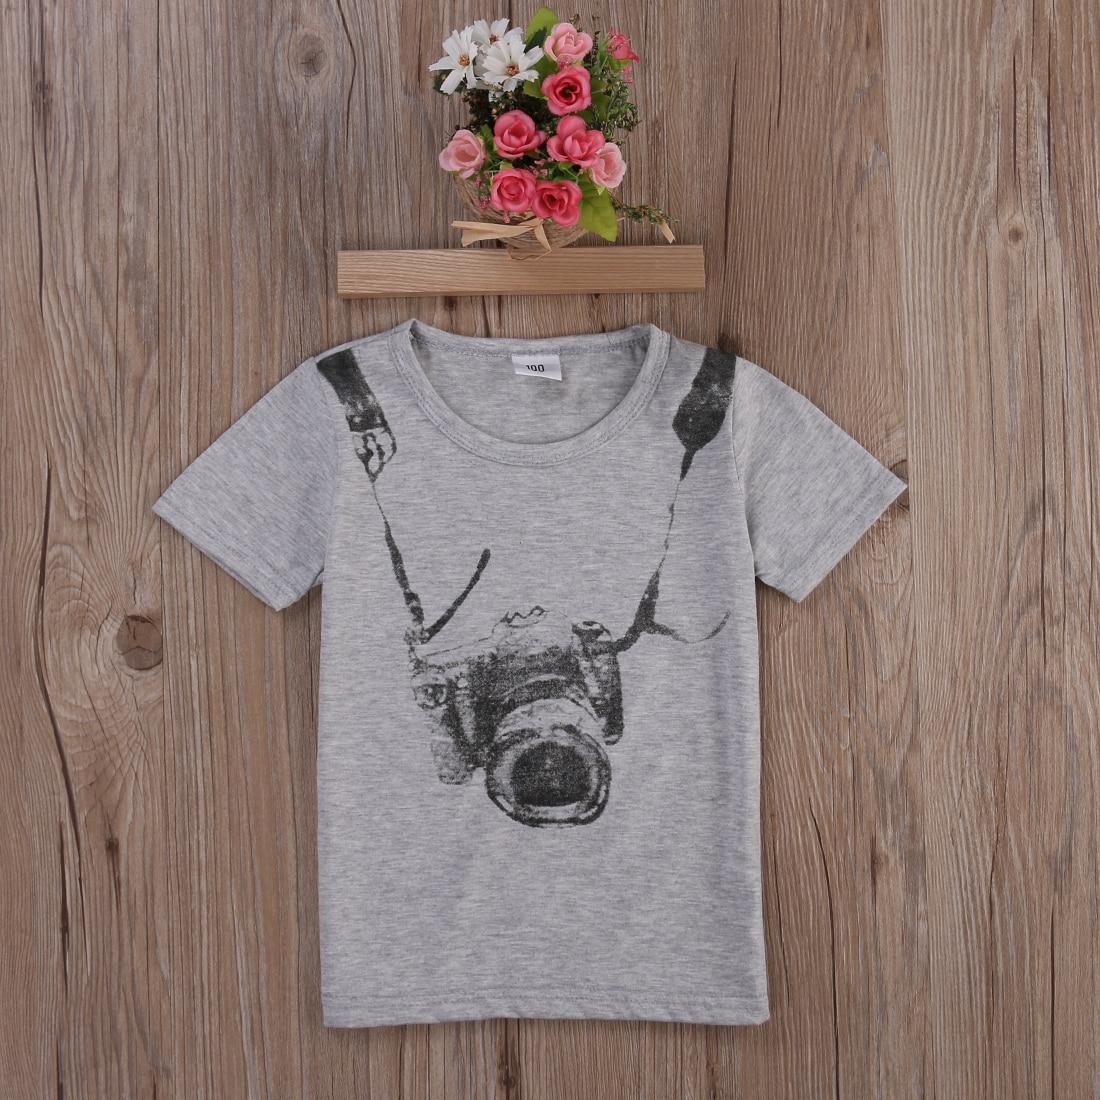 Fashion 1pcs Baby Boys T-Shirts Tops Sets Boy